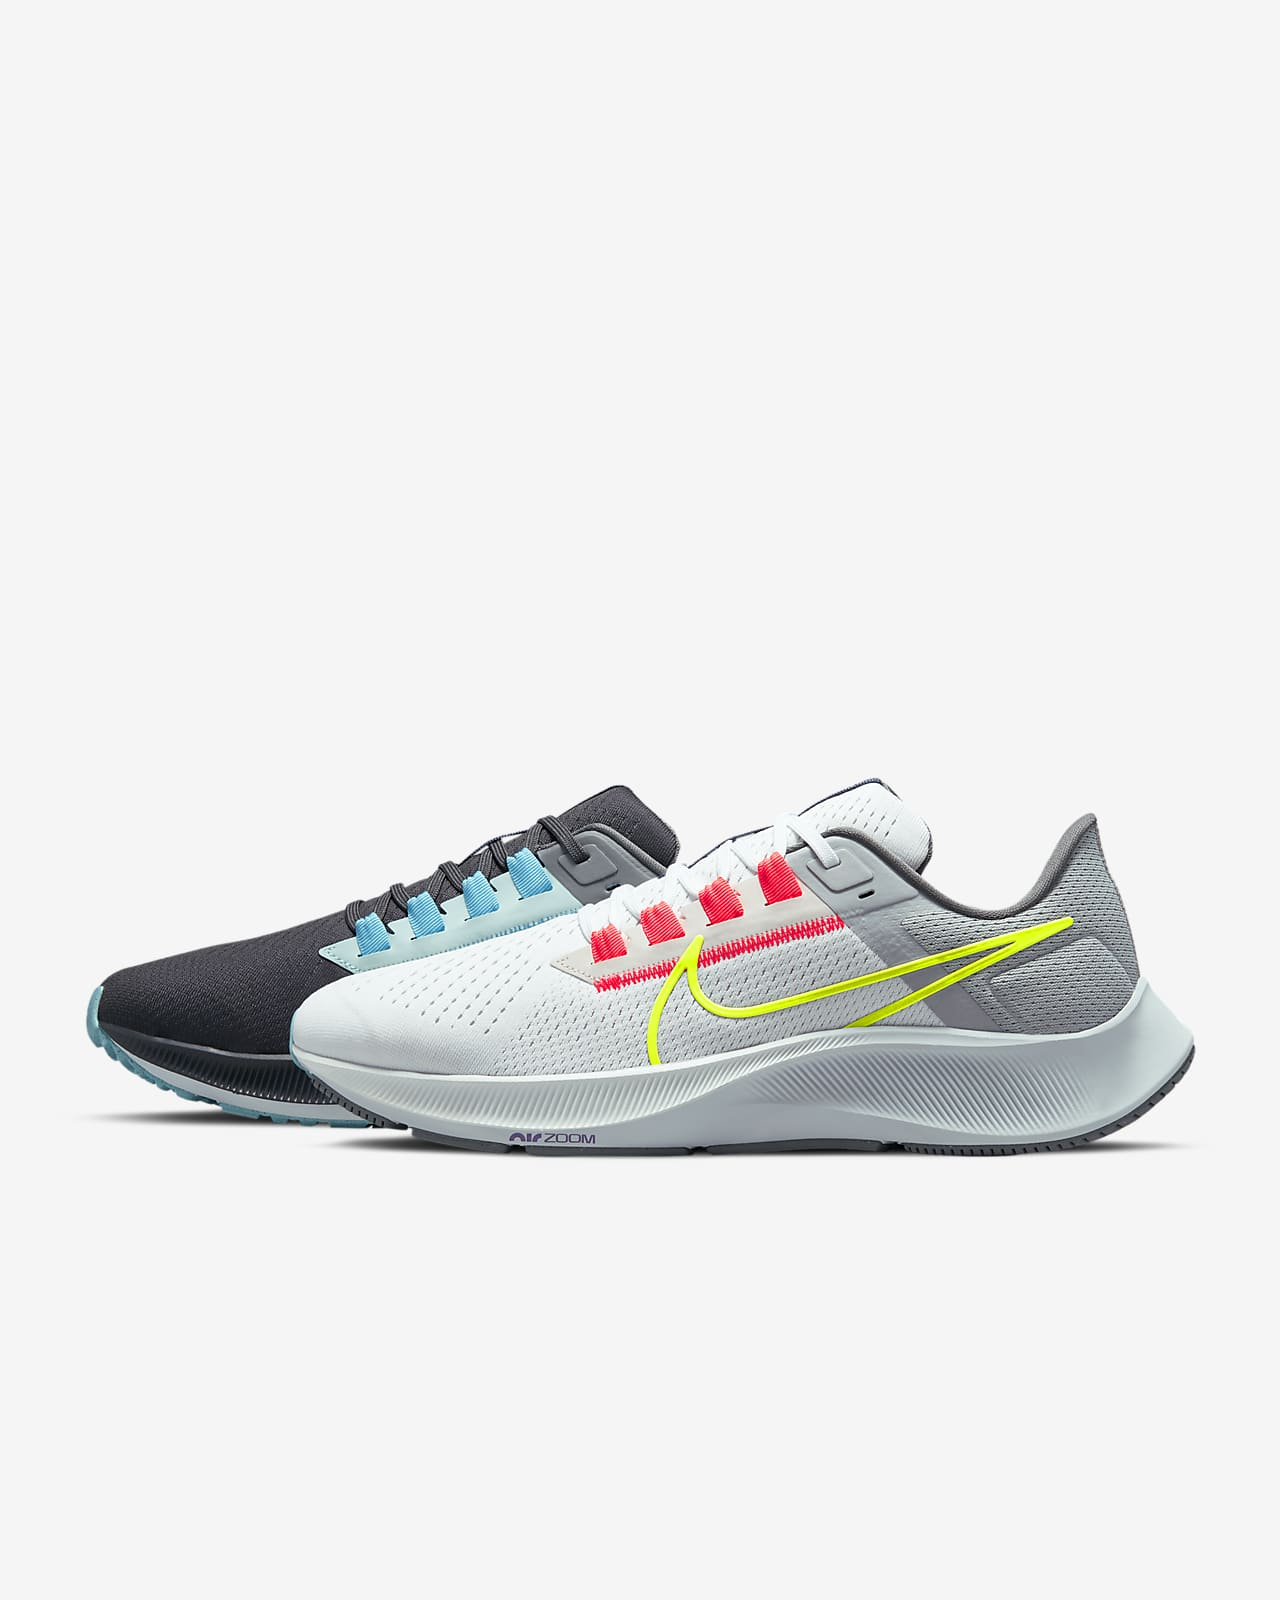 Nike Air Zoom Pegasus 38 Limited Edition Men's Running Shoe